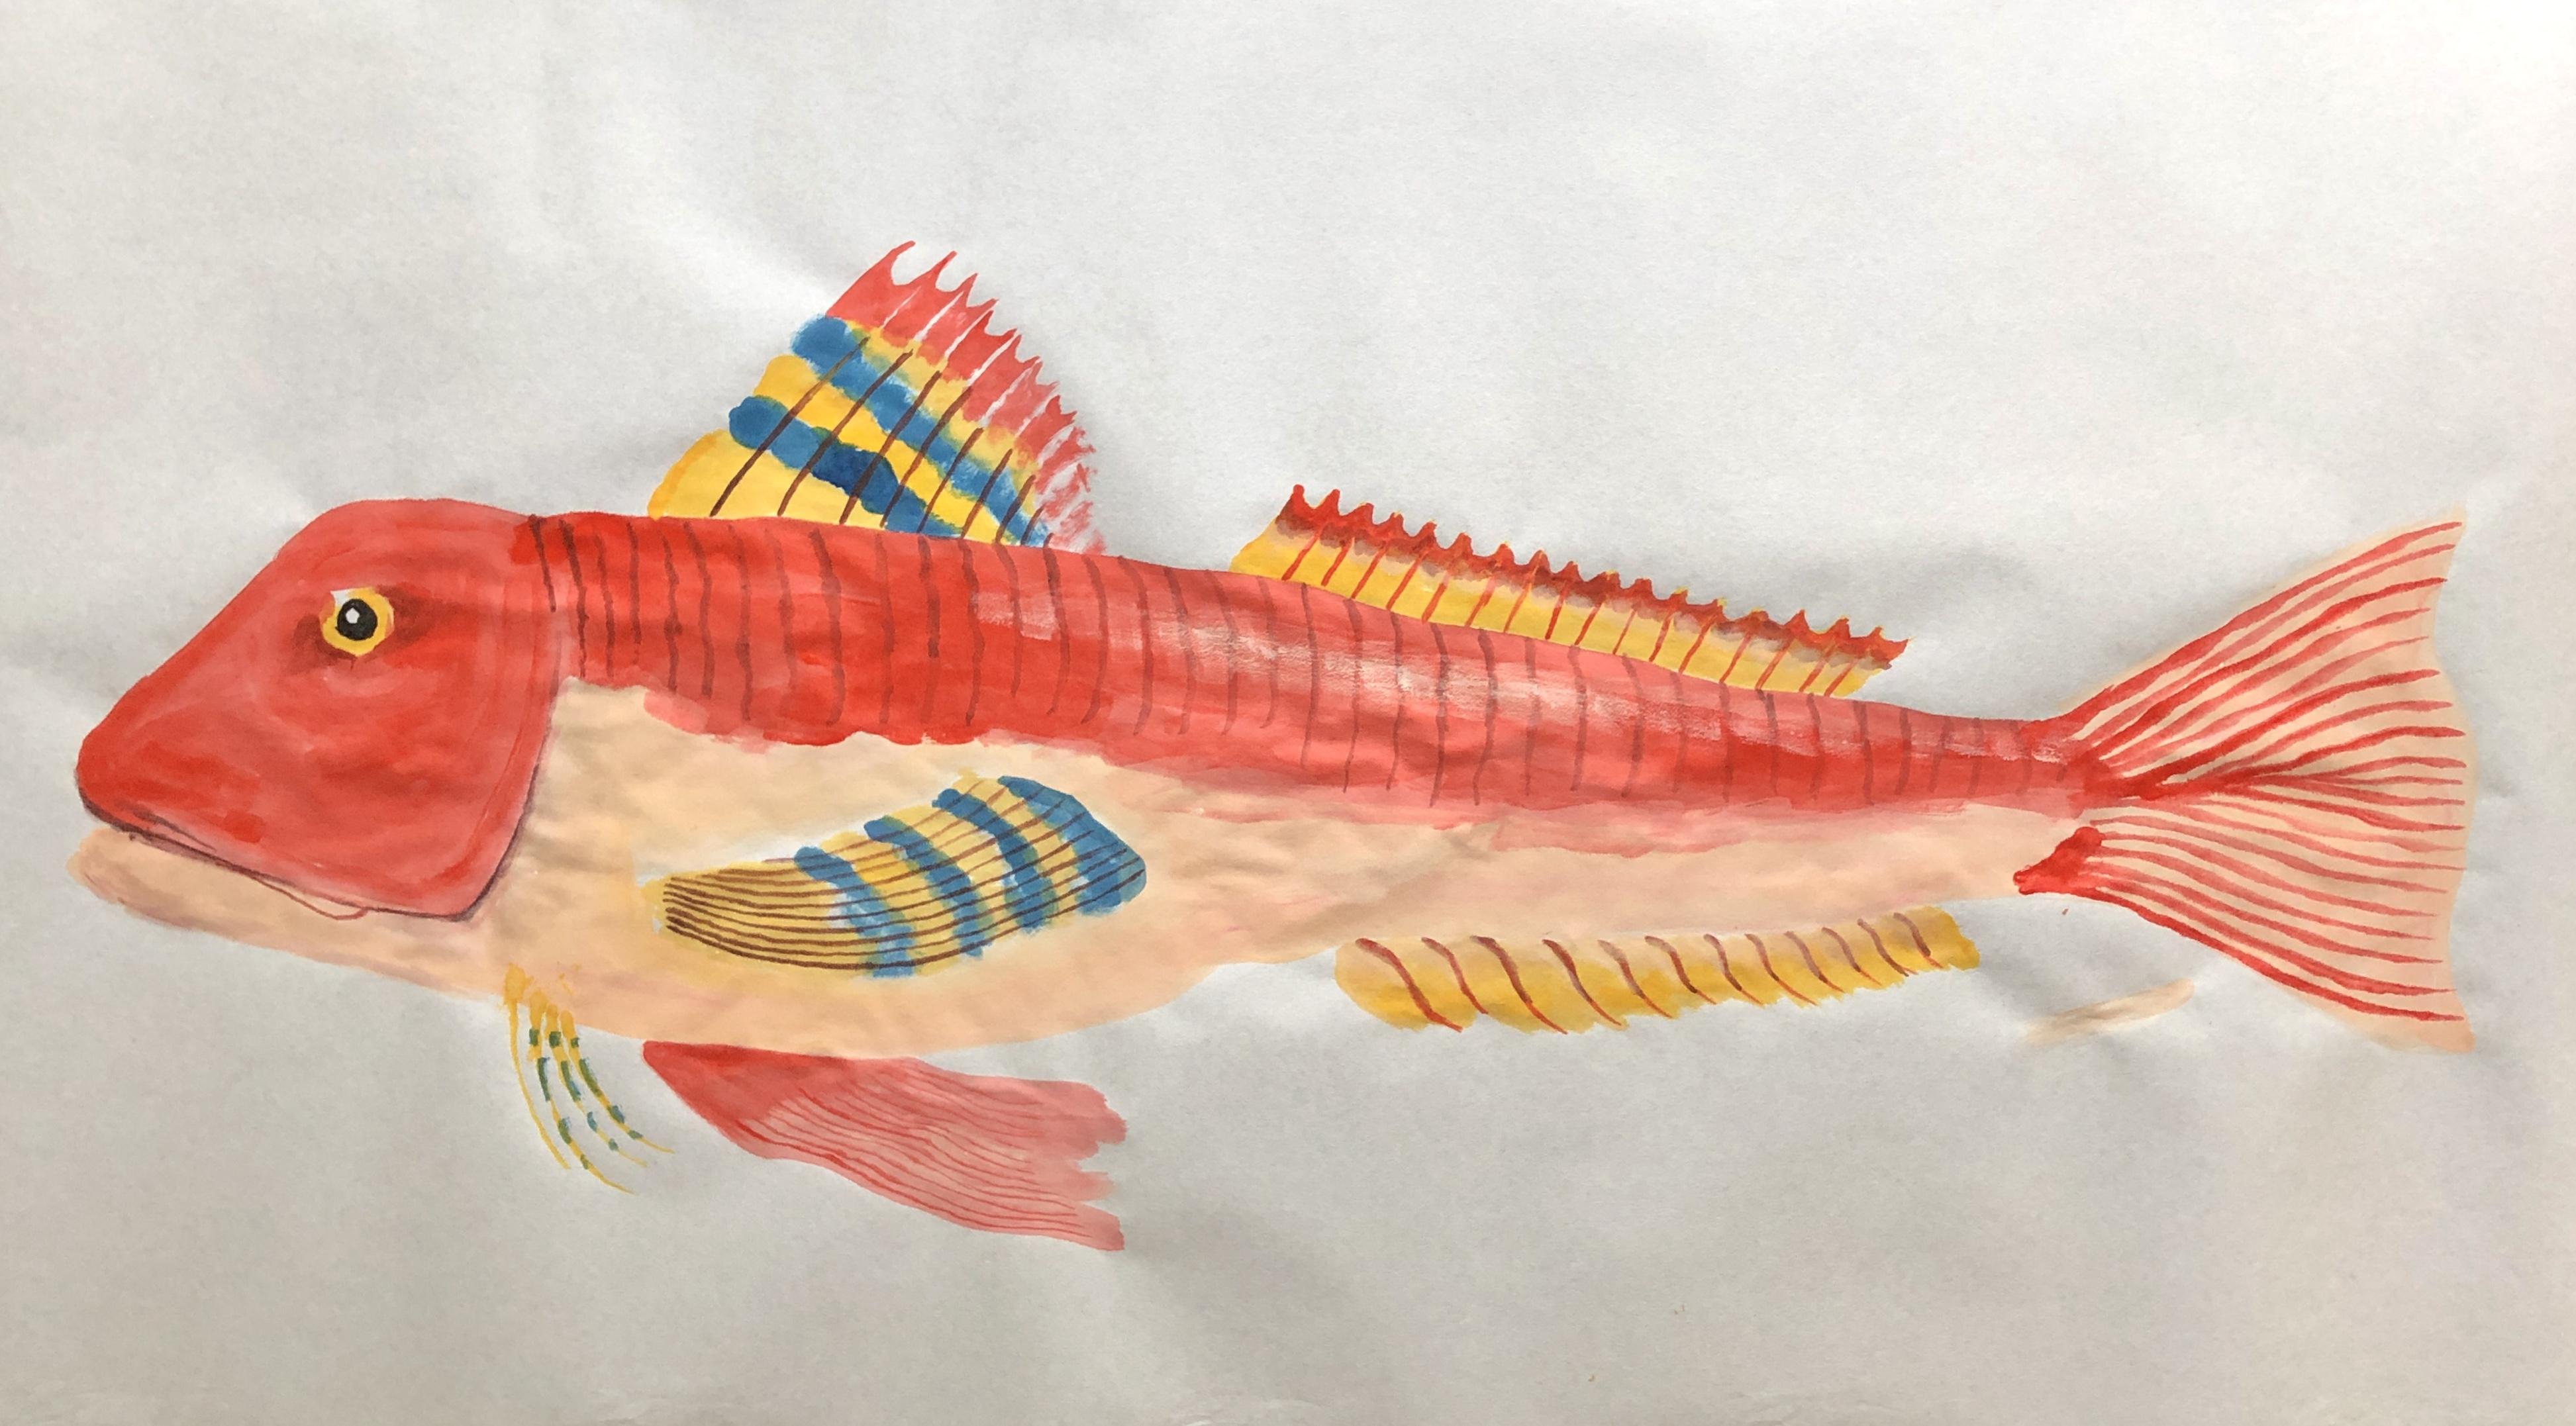 Straket Gurnard, 2021, Tinte, Gouache, Acryl auf Japanpapier, 45 x 85 cm